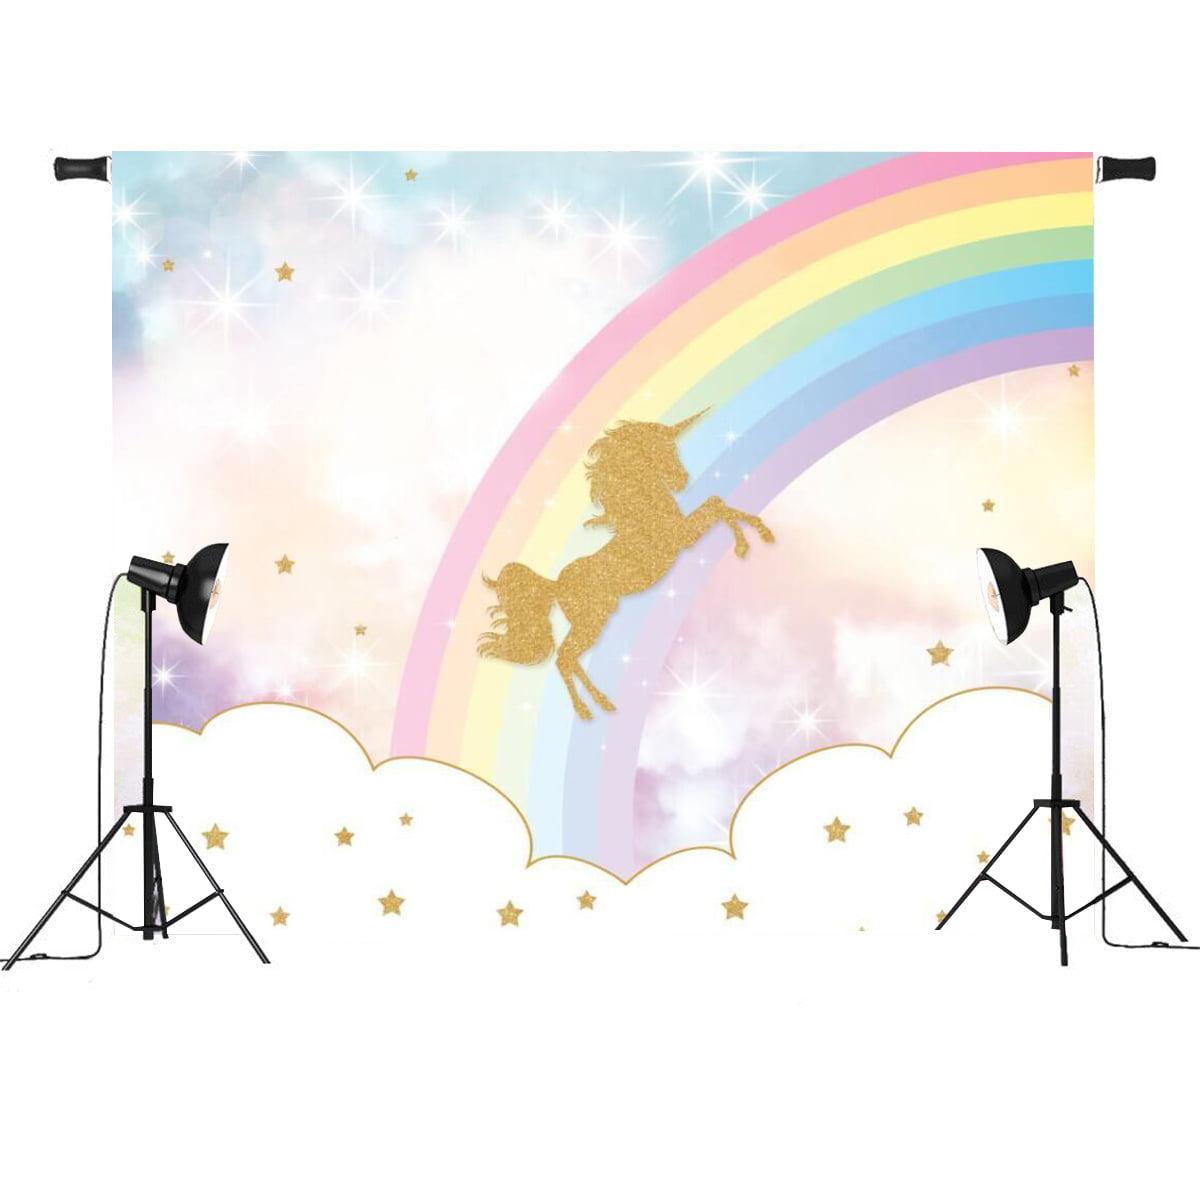 7x5FT/3x5FT Rainbow Sky Gold Unicorn Stars Baby Custom Photo Background Backdrop Vinyl,150*210cm color